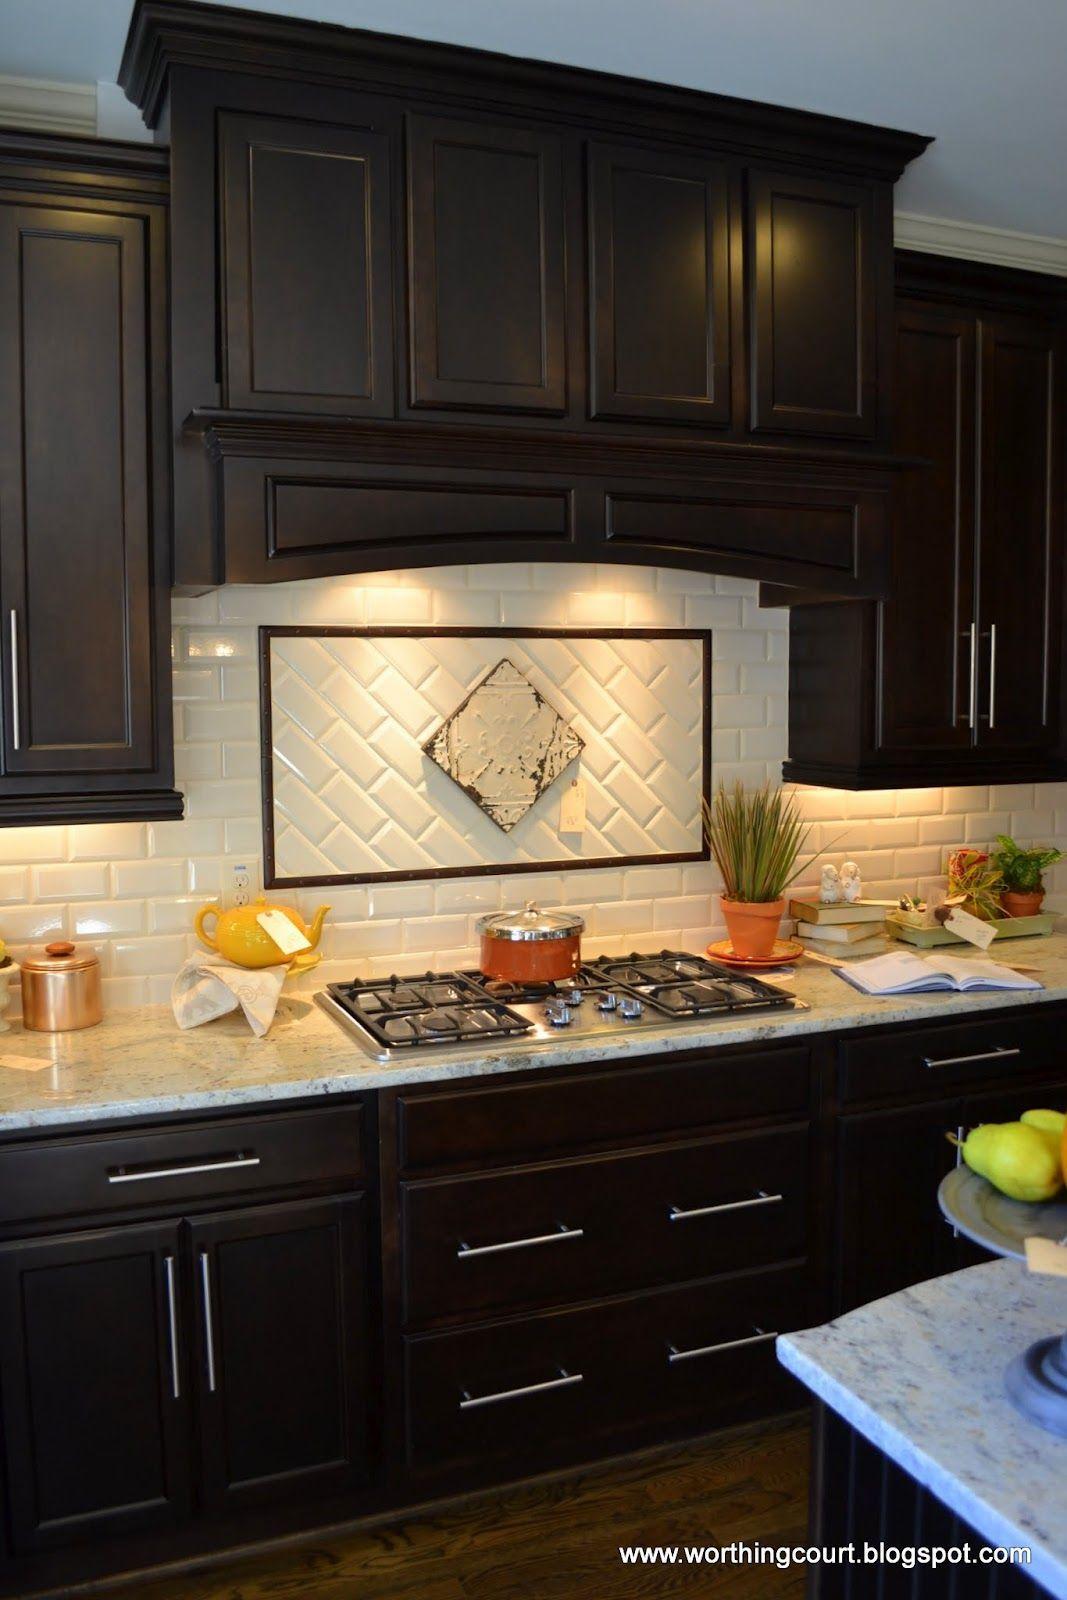 contemporary kitchen backsplash ideas with dark cabinets wainscoting contemporary kitchen on kitchen ideas with dark cabinets id=59075